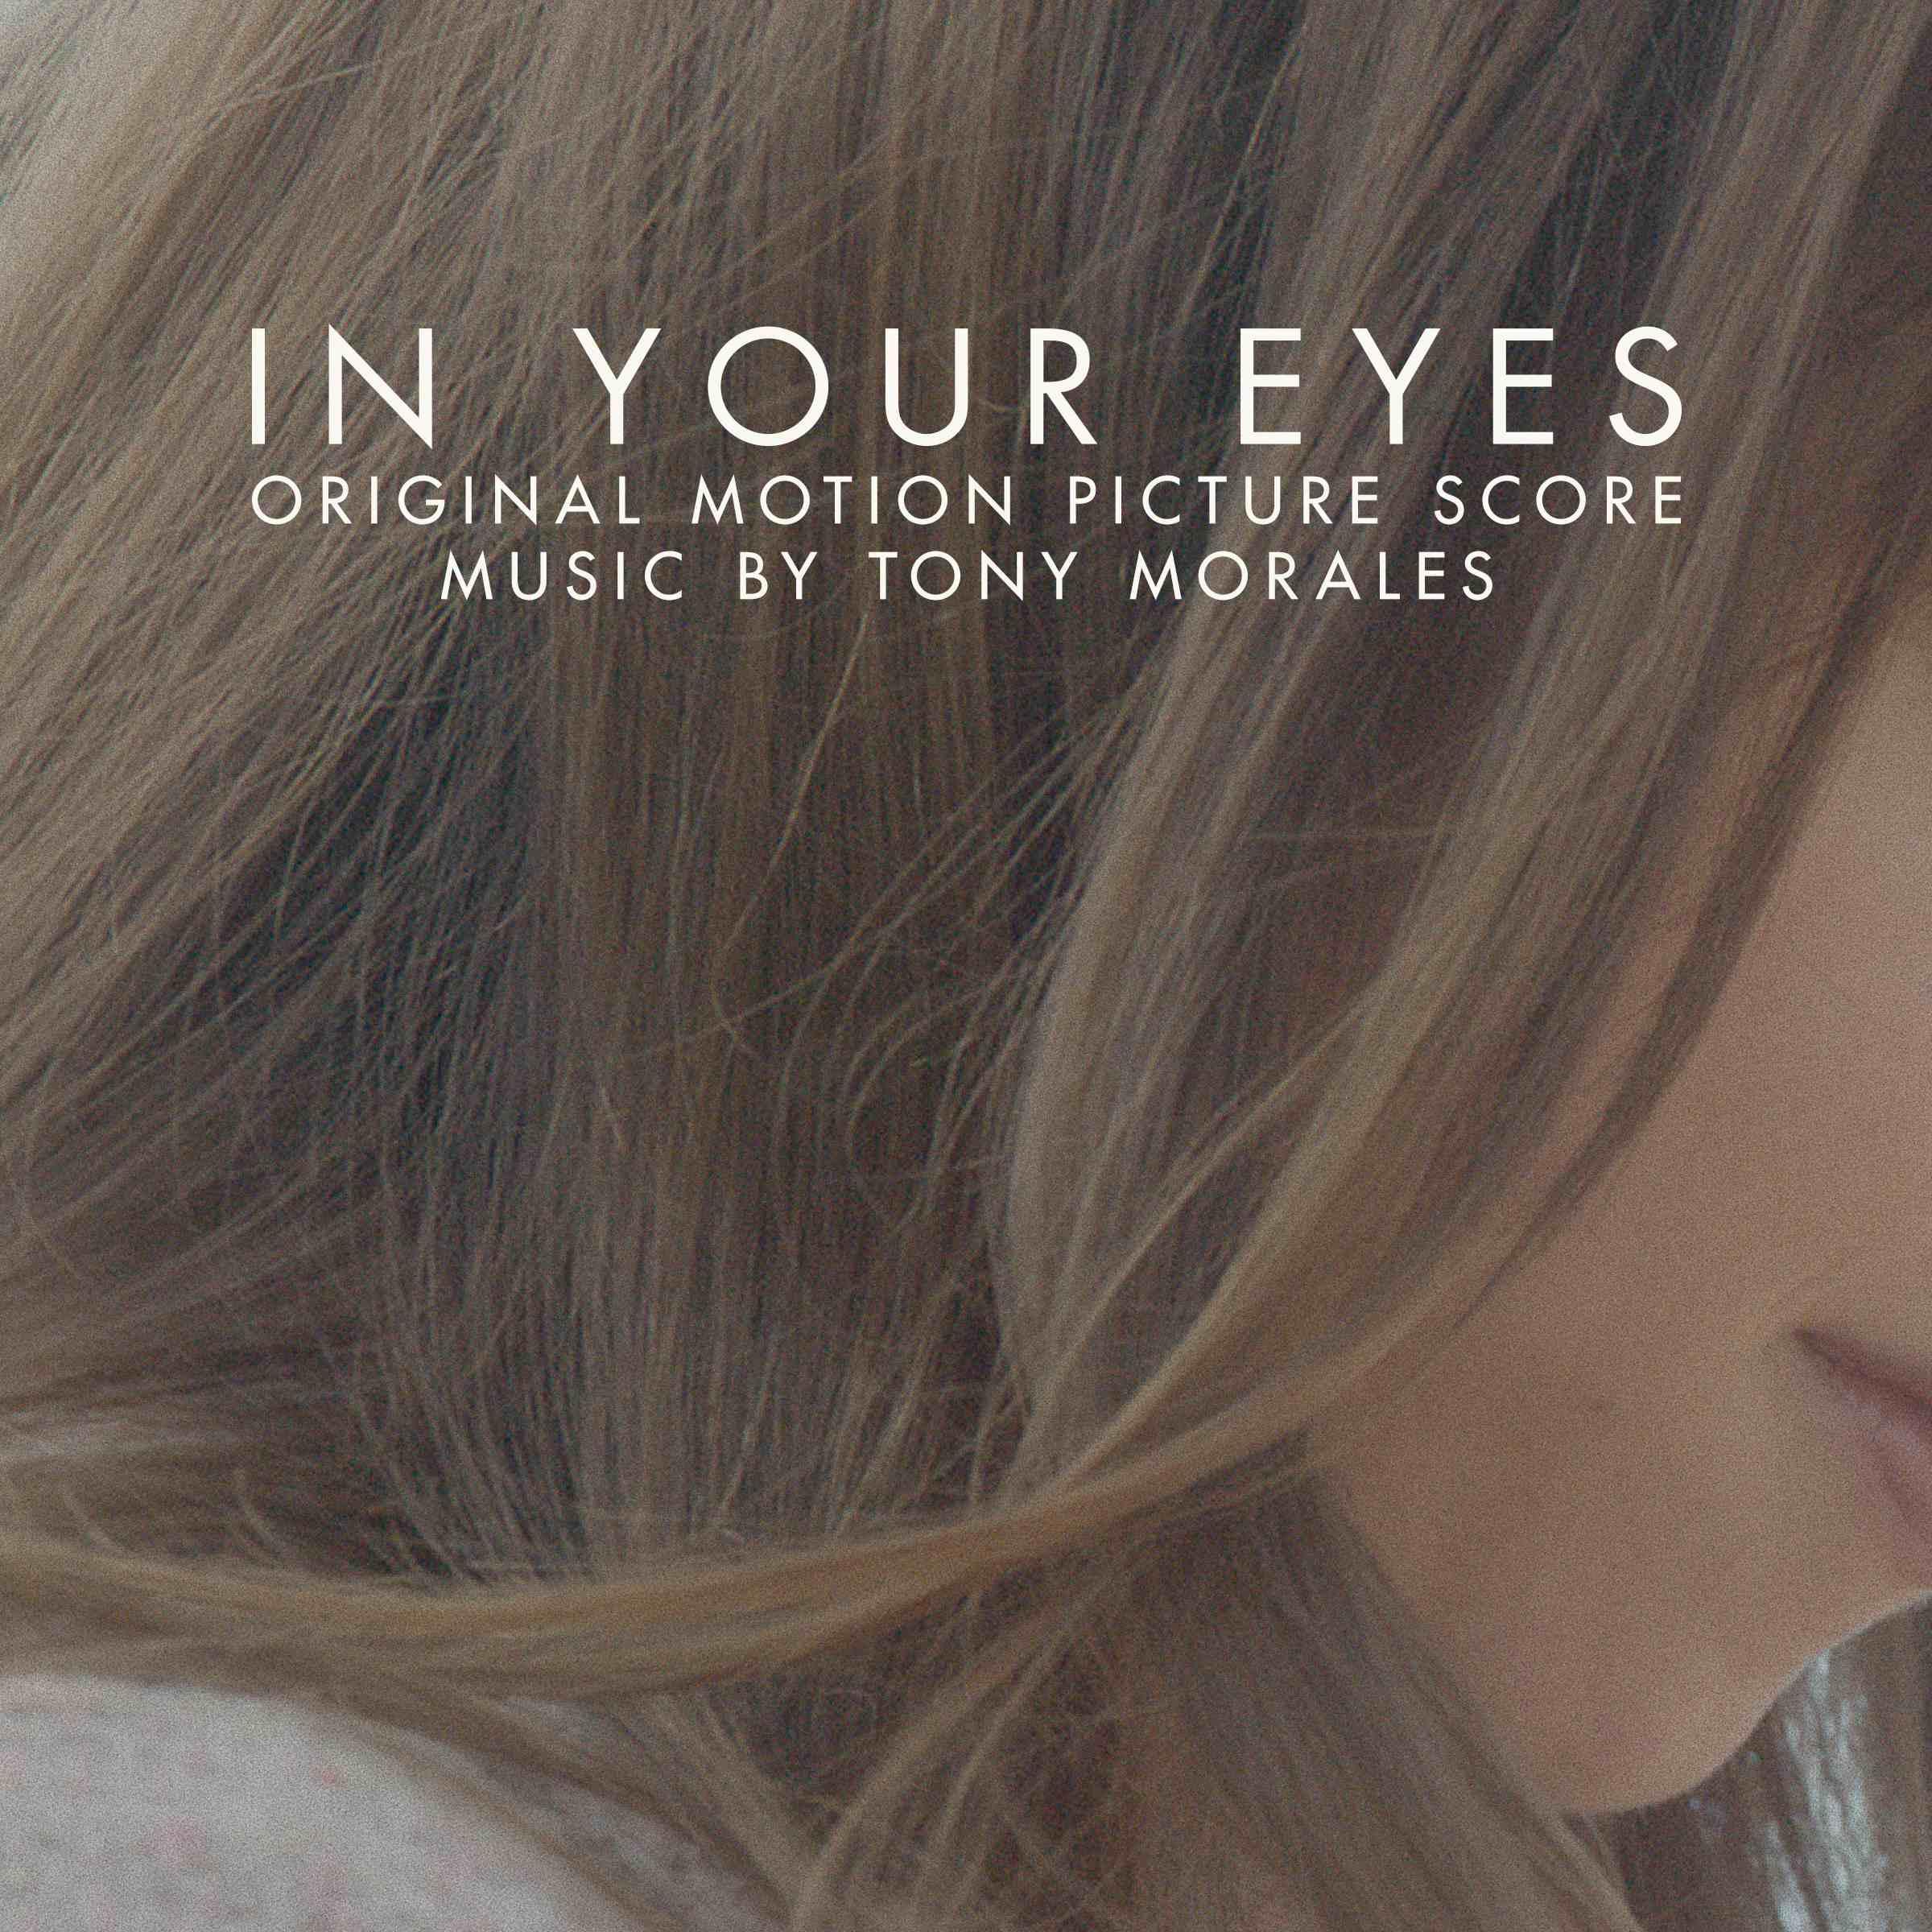 In Your Eyes' Score Album Details | Film Music Reporter